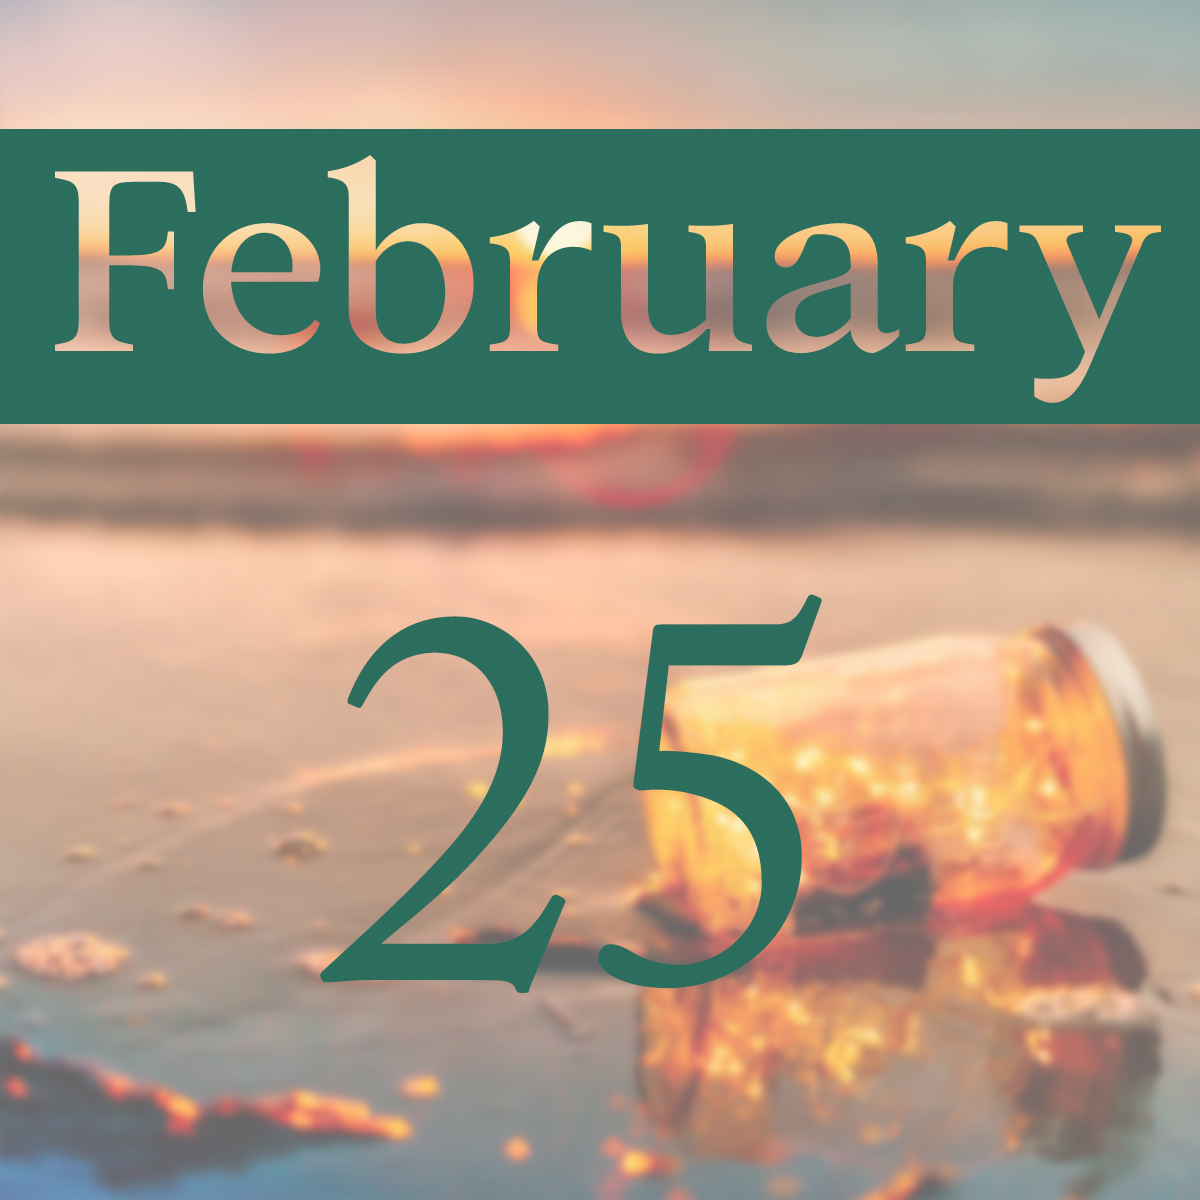 Tuesday, February 25th